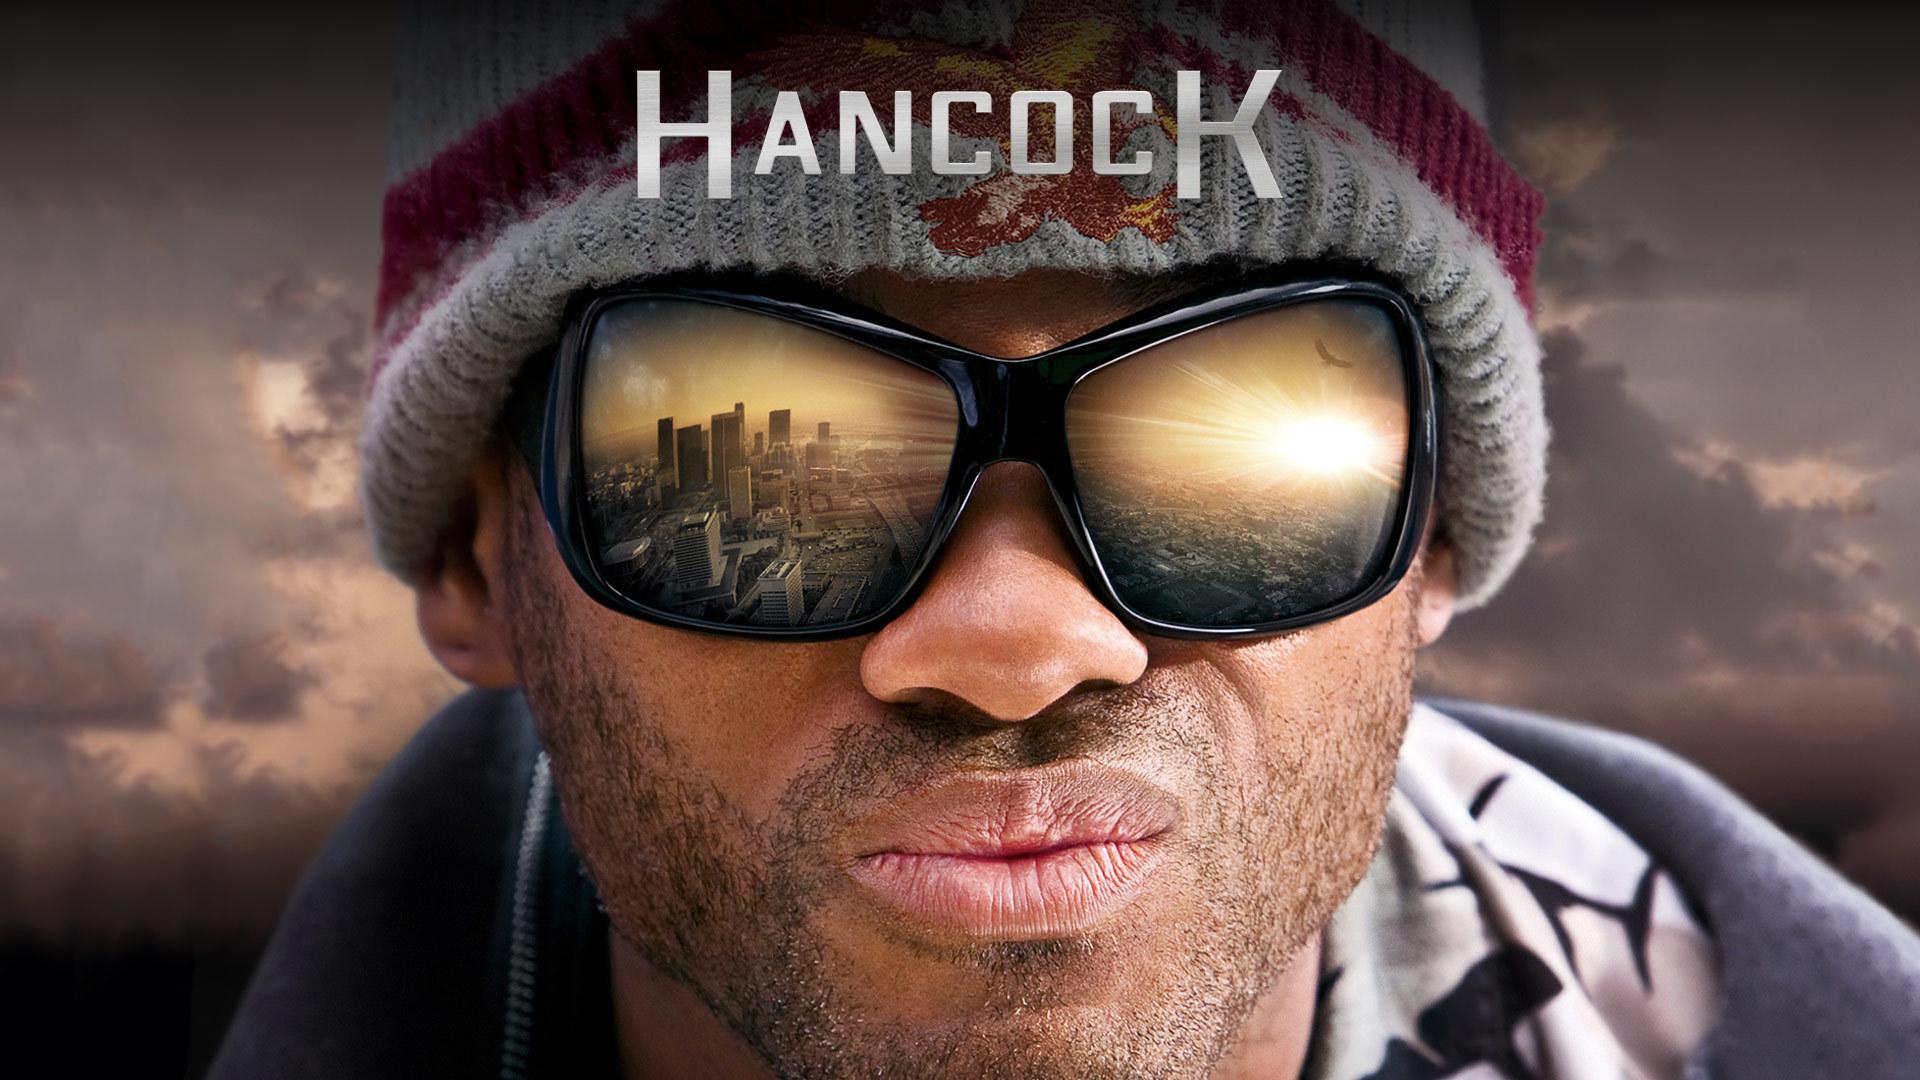 Hancock [dt./OV]